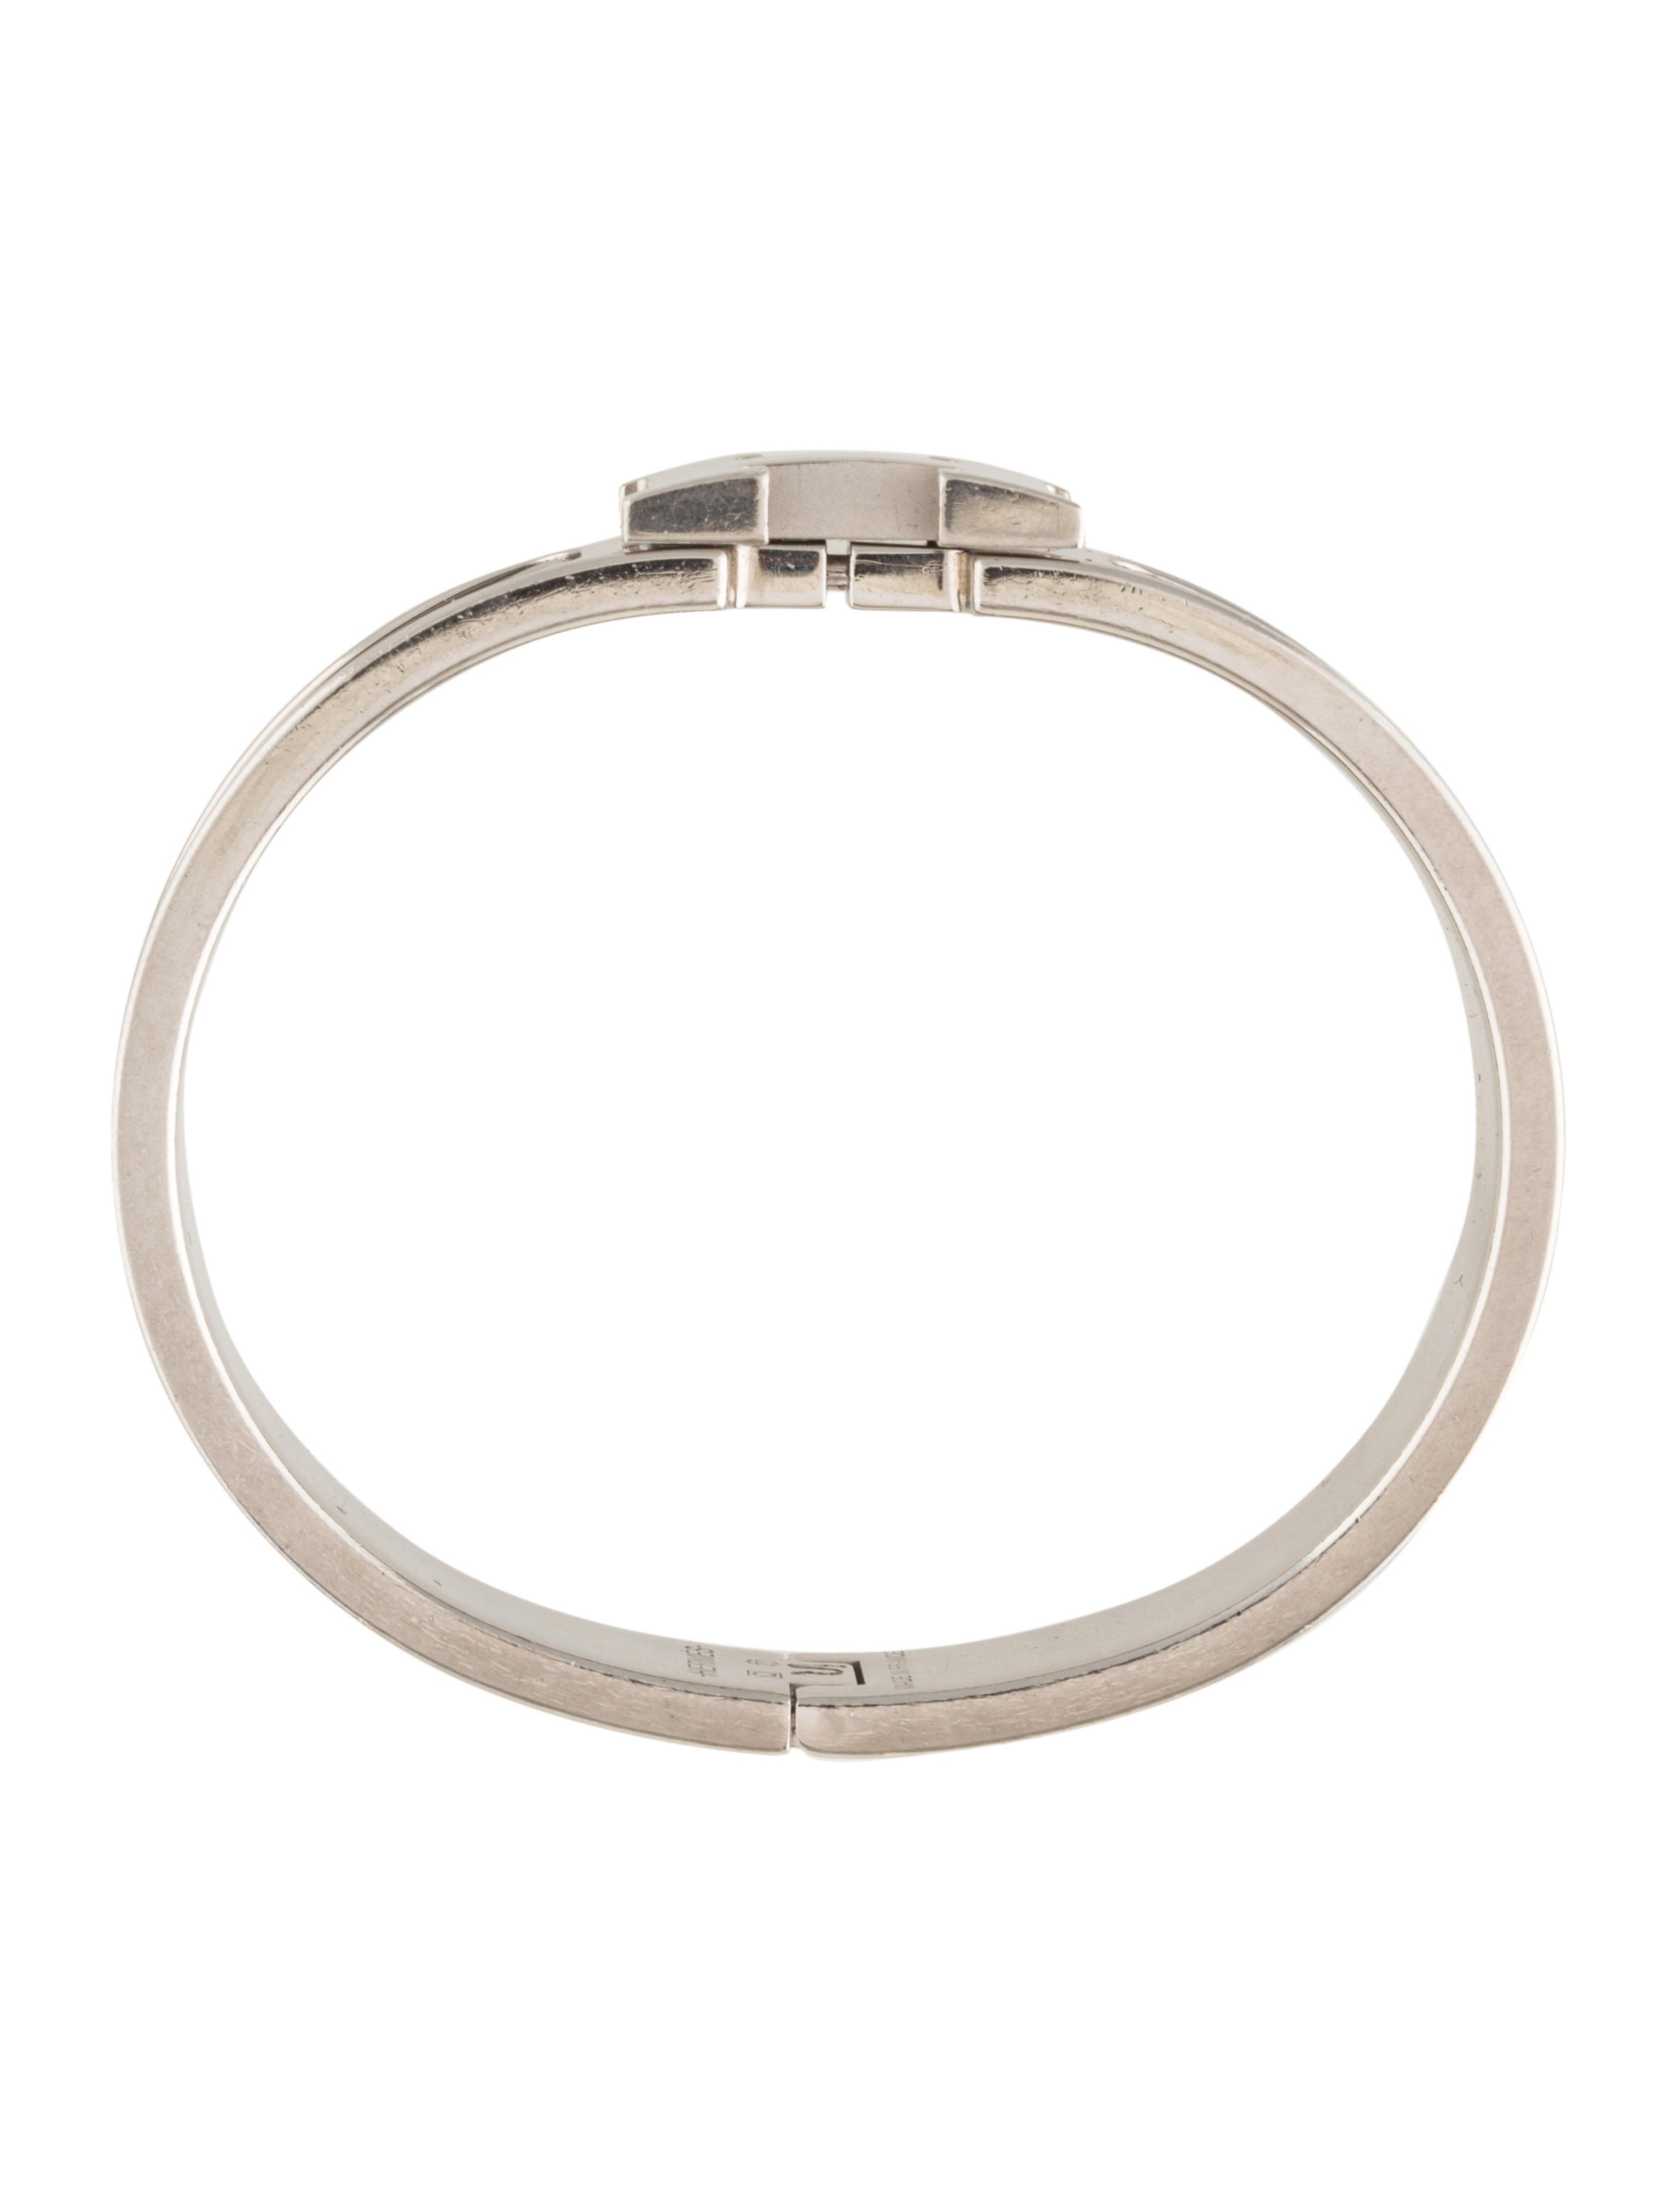 herm s pm narrow clic clac h bangle bracelets. Black Bedroom Furniture Sets. Home Design Ideas